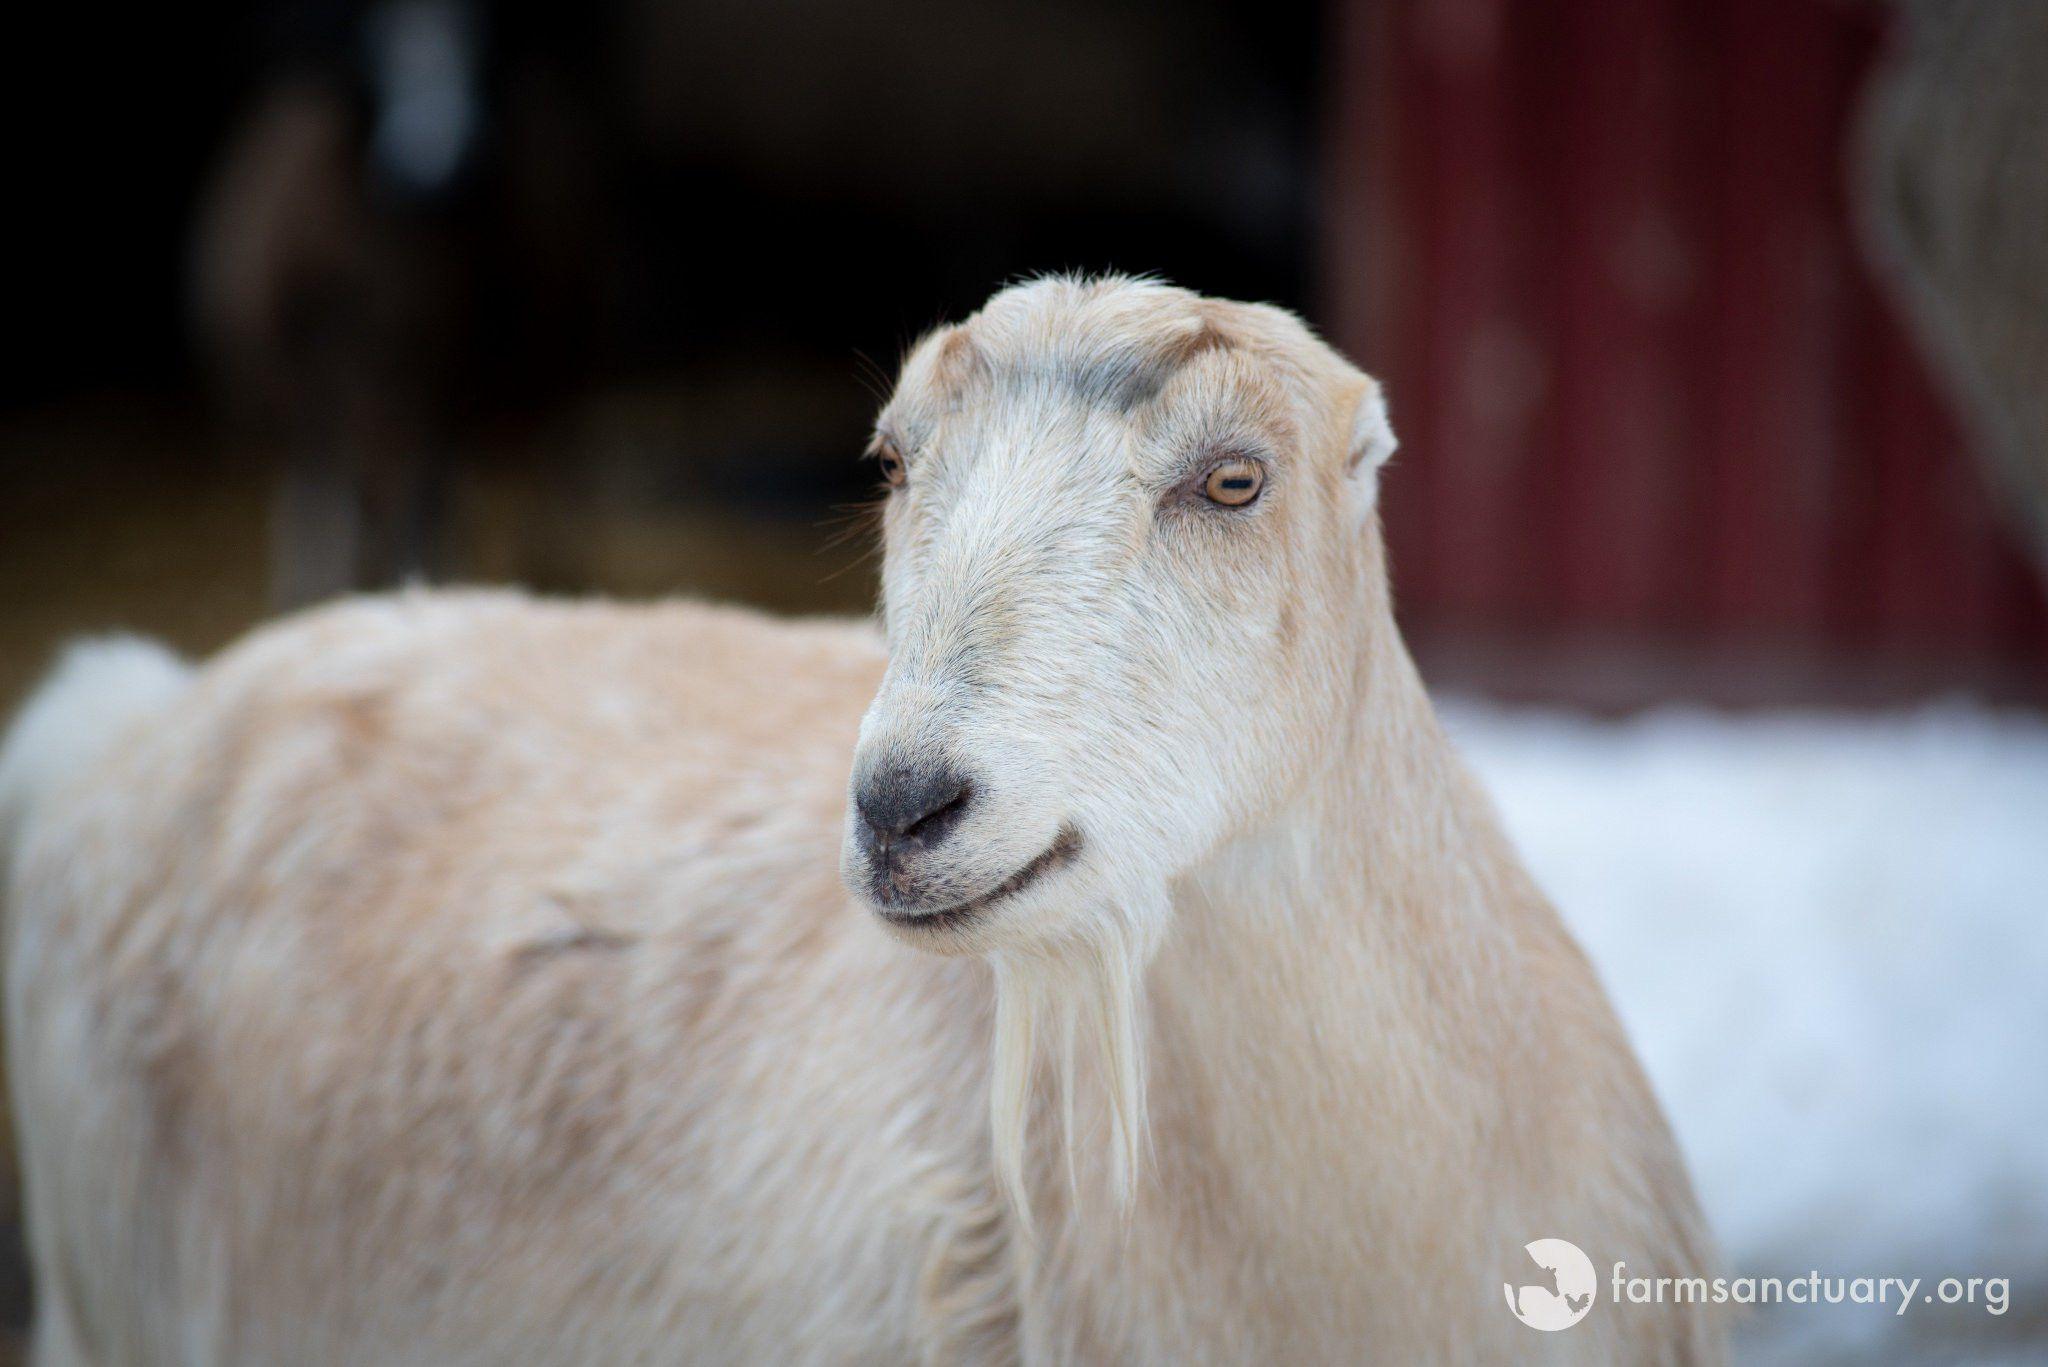 6 Sheep Treats Farm Animals Dtlp0nmwkaeg60w Large In